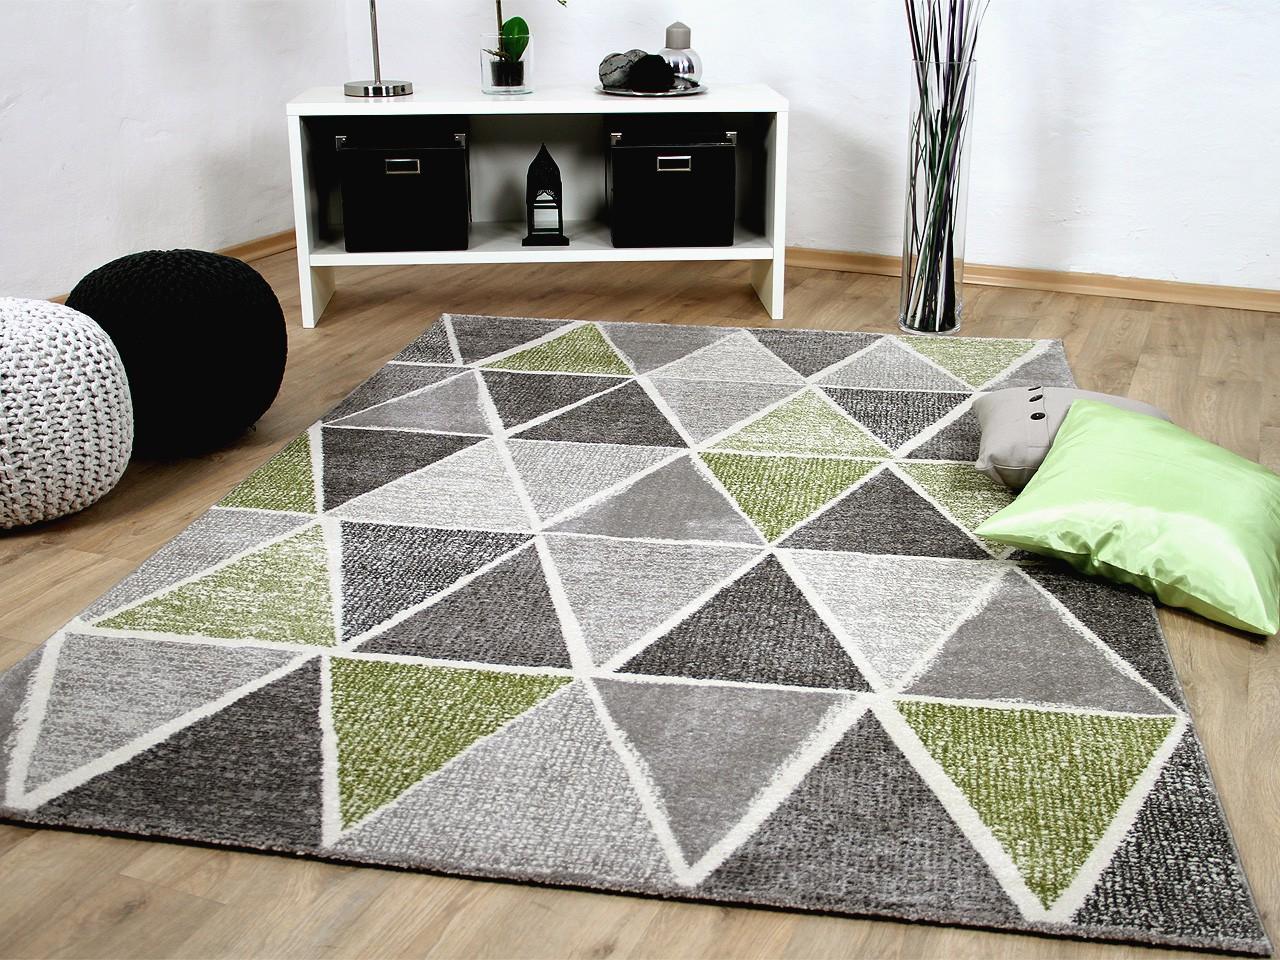 designer teppich sevilla modern grau gr n prisma teppiche. Black Bedroom Furniture Sets. Home Design Ideas